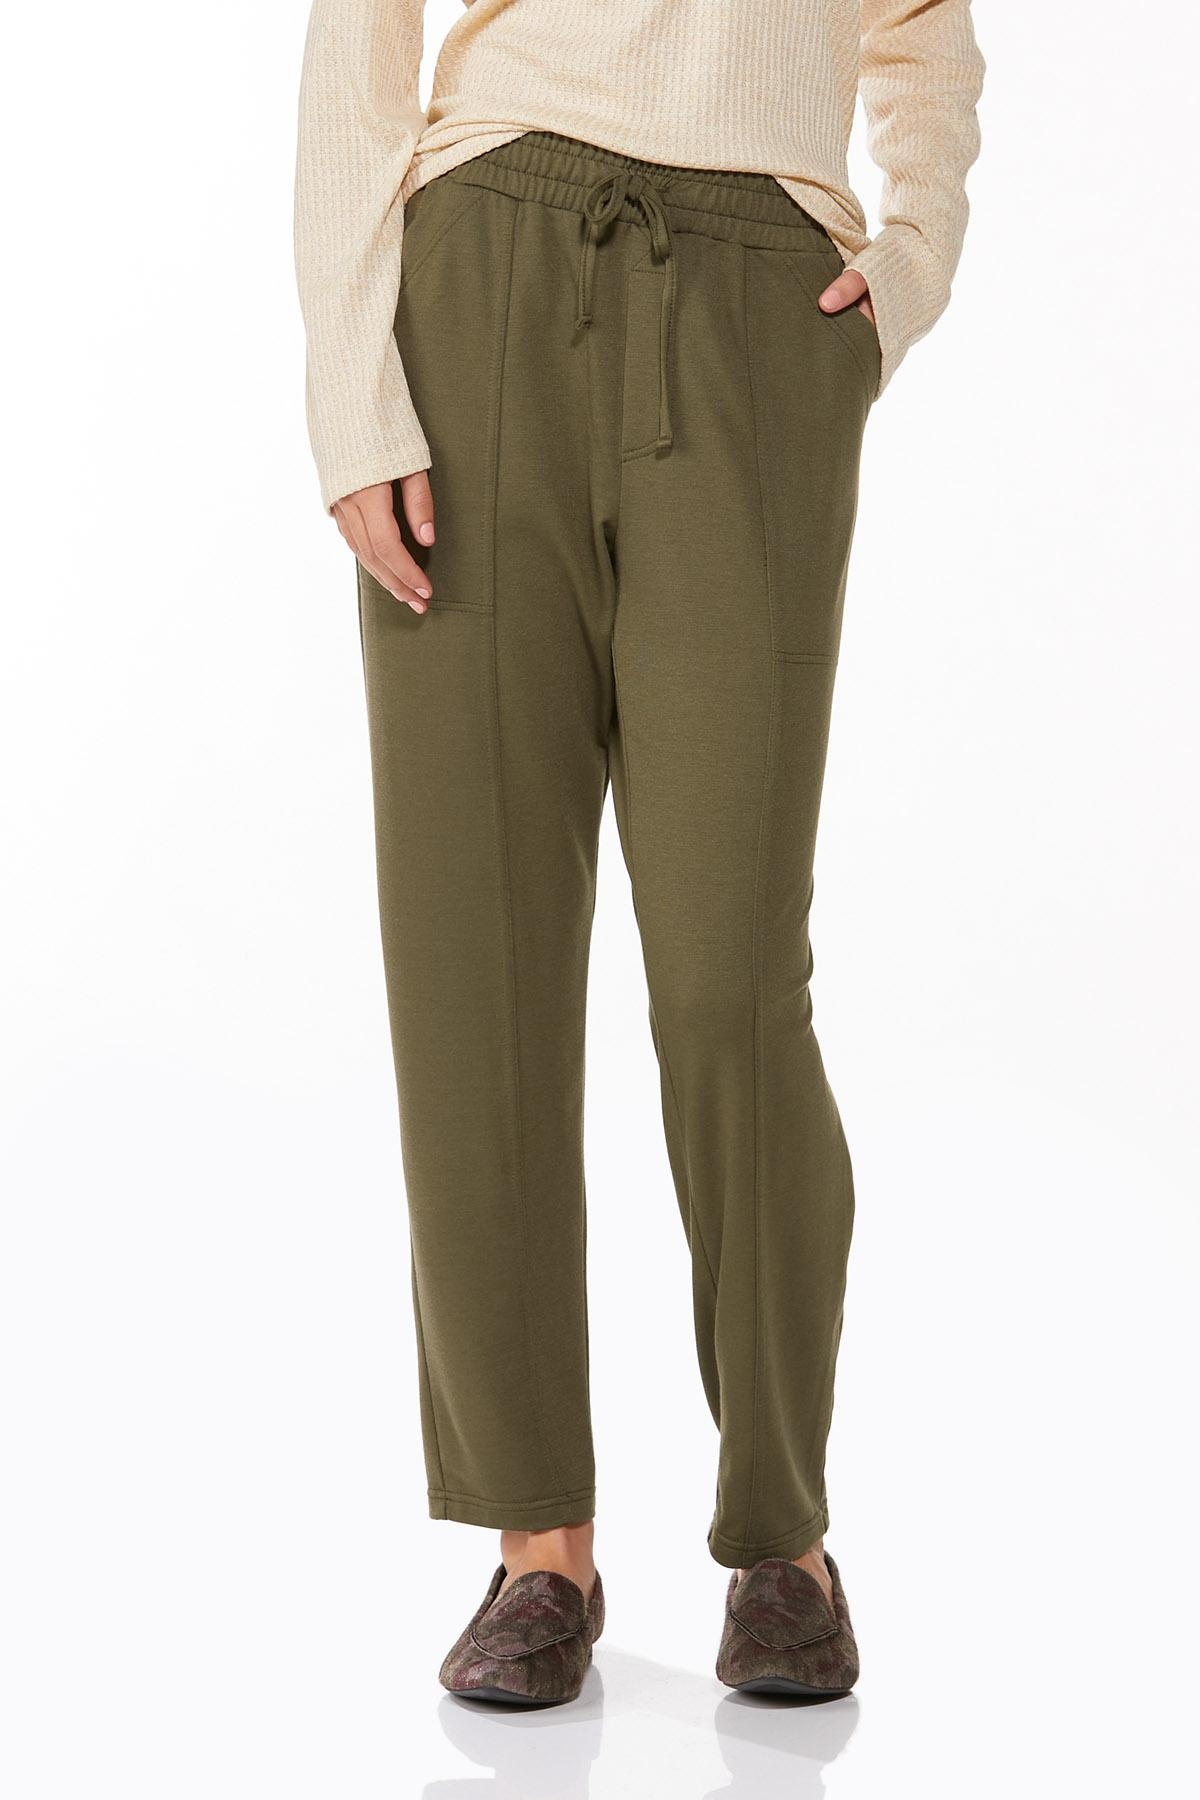 Petite Soft Olive Pants (Item #44655263)